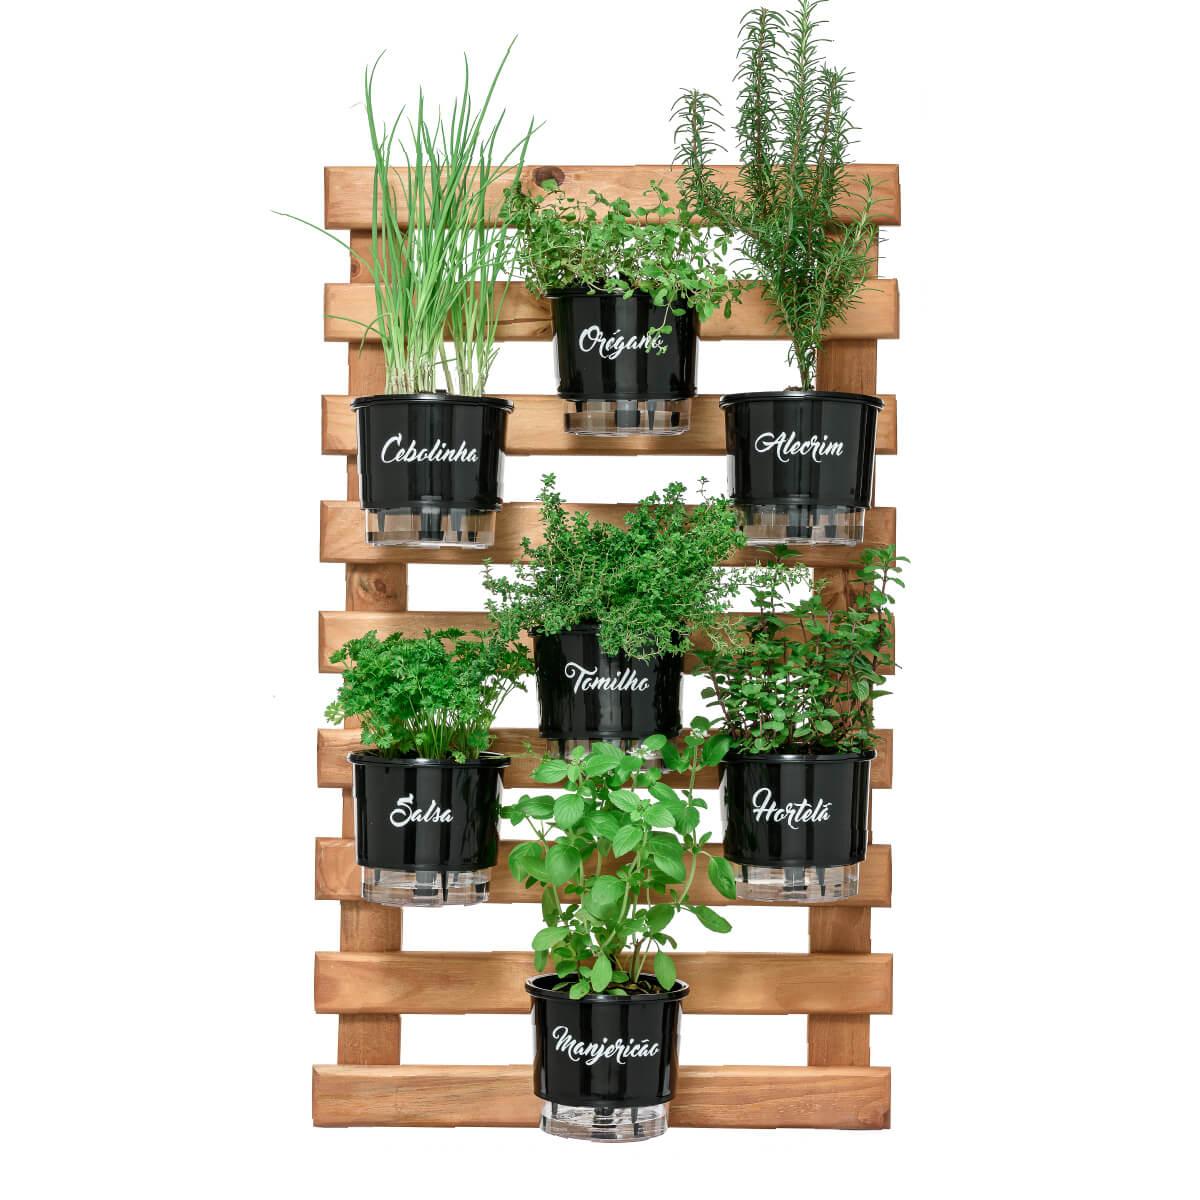 Kit Horta Vertical 60cm x 100cm com 7 Vasos Pretos Gourmet  - Vasos Raiz Loja Oficial